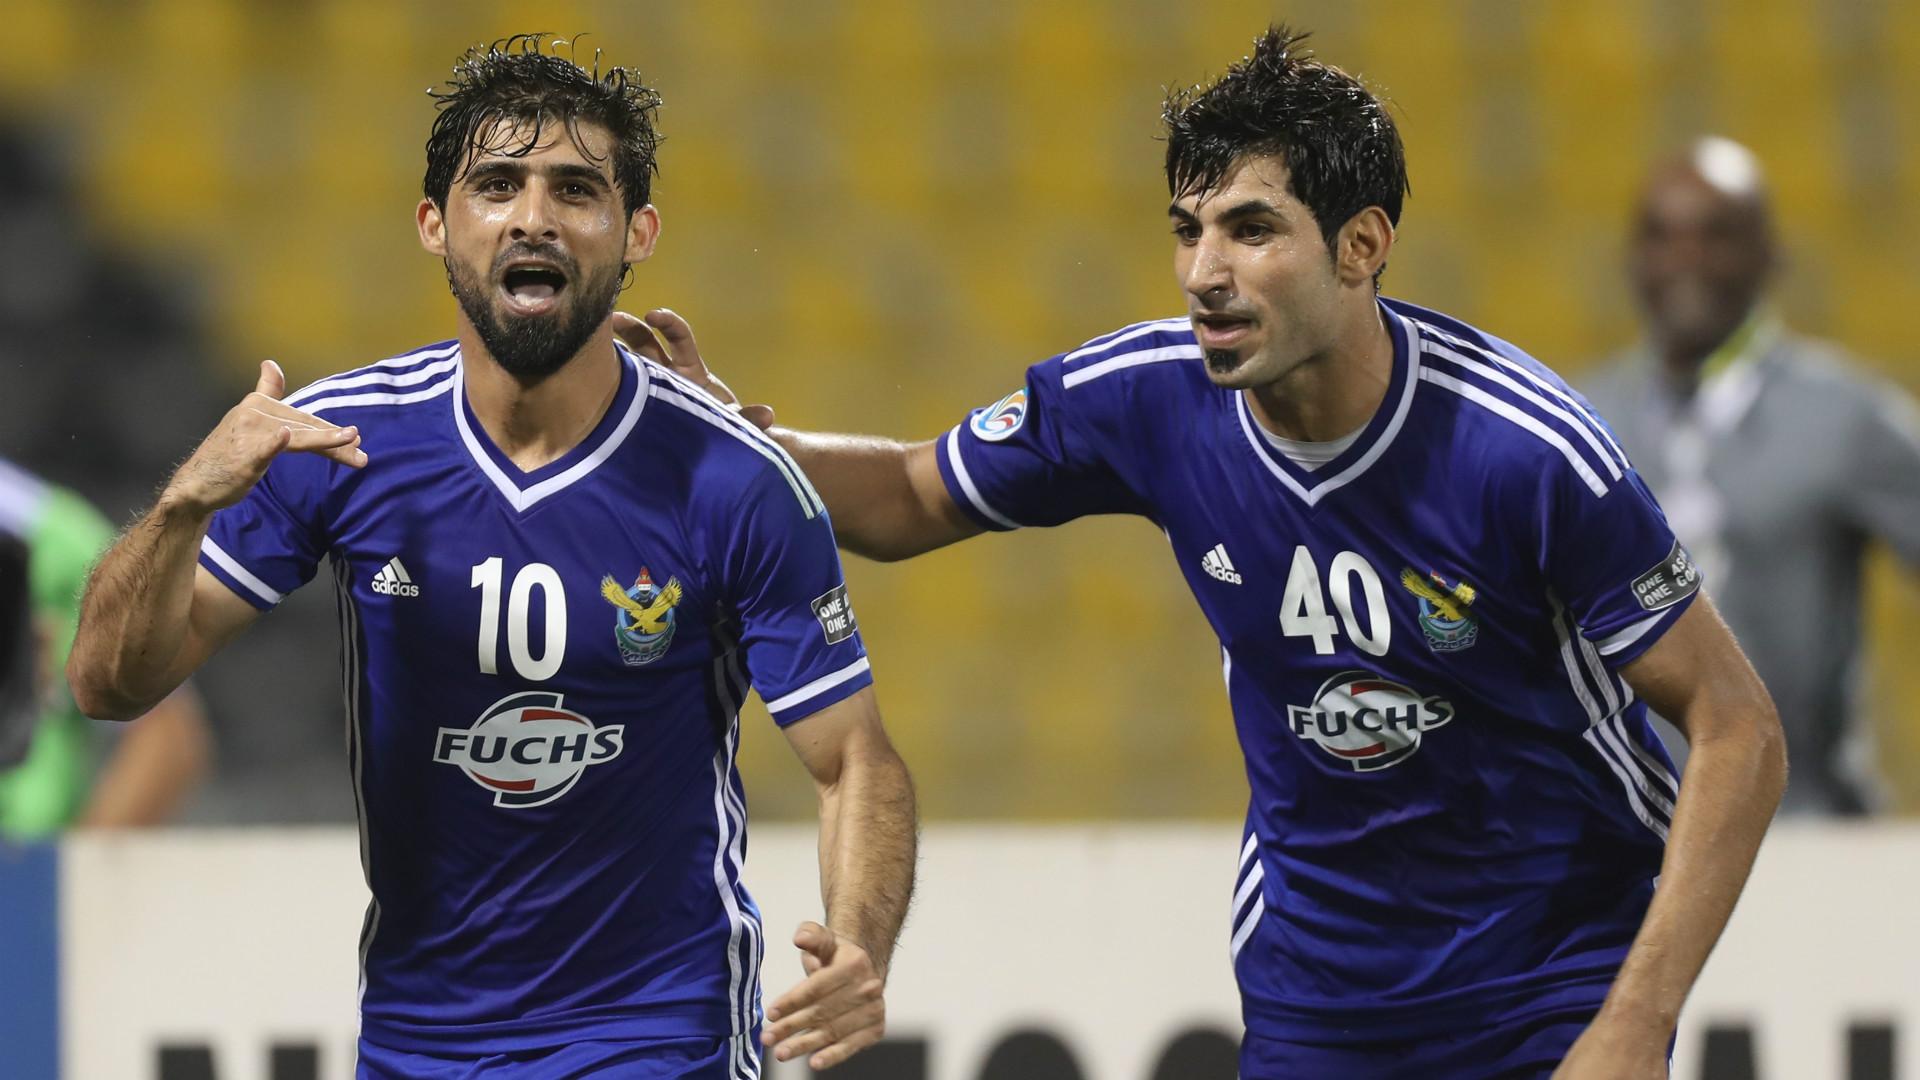 Hammadi Ahmed Abdullah Amjed Radhi Al-Quwa Al-Jawiya Bengaluru FC AFC Cup Final